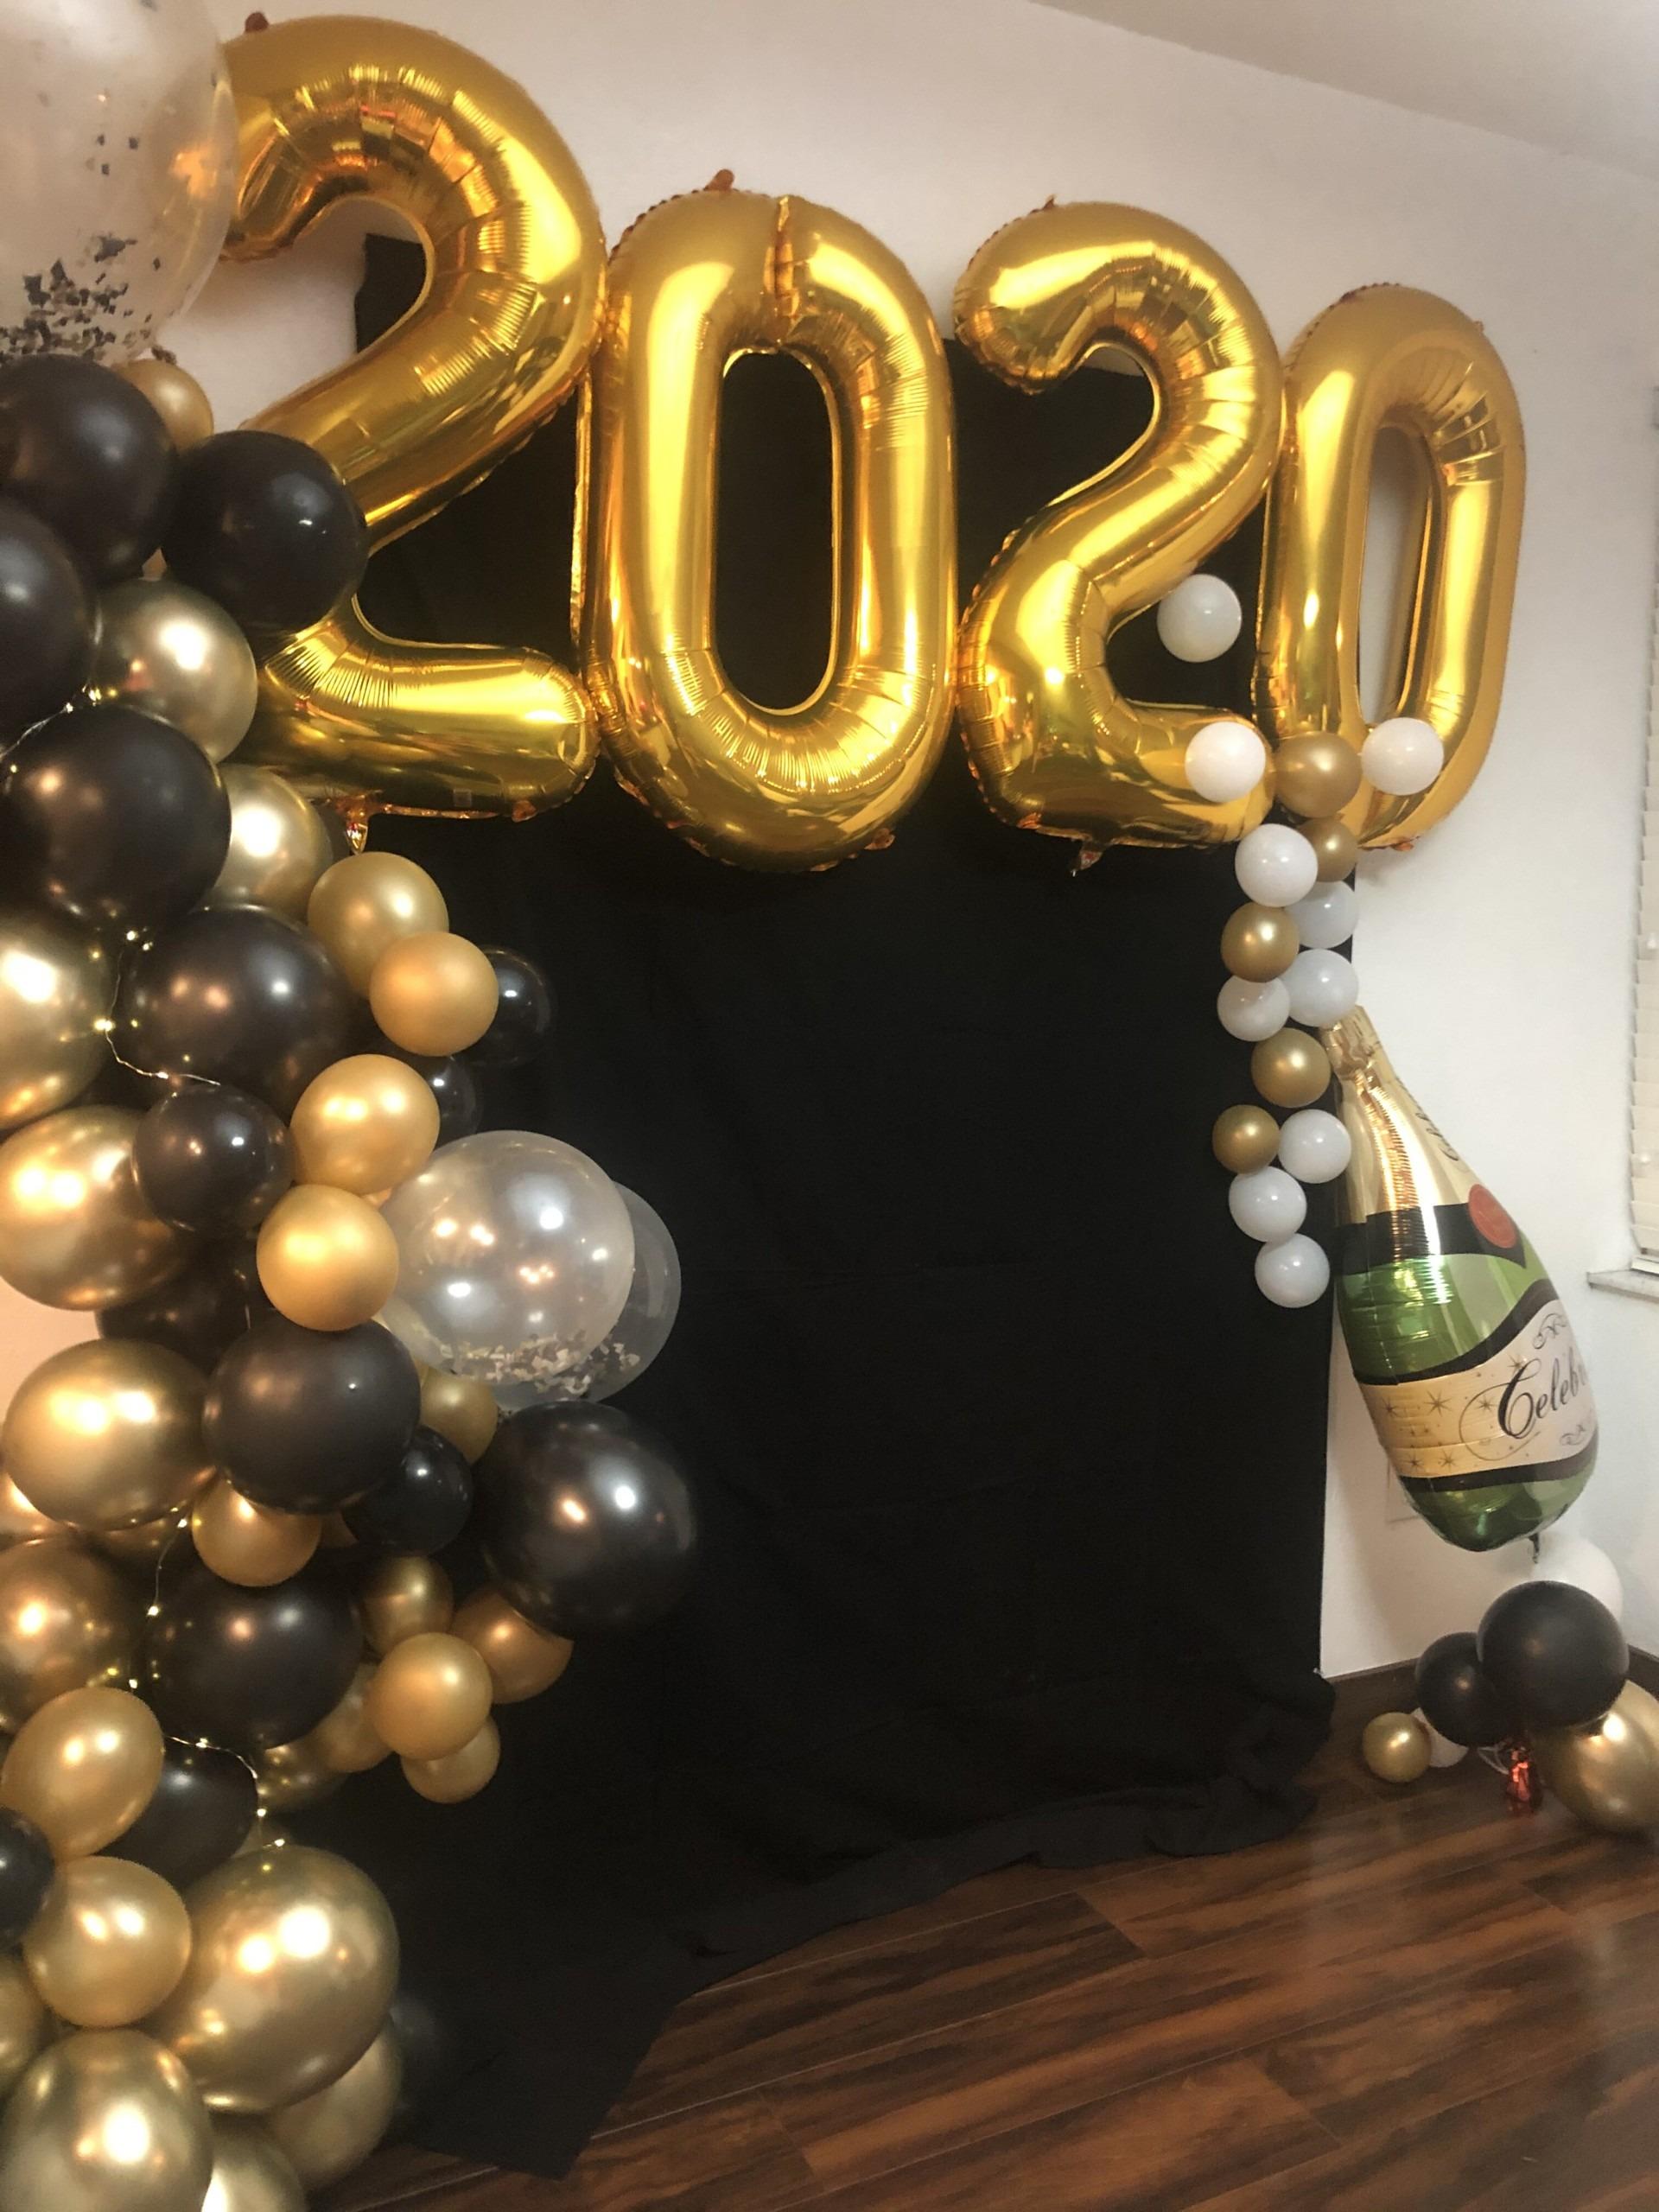 2020 room decoration